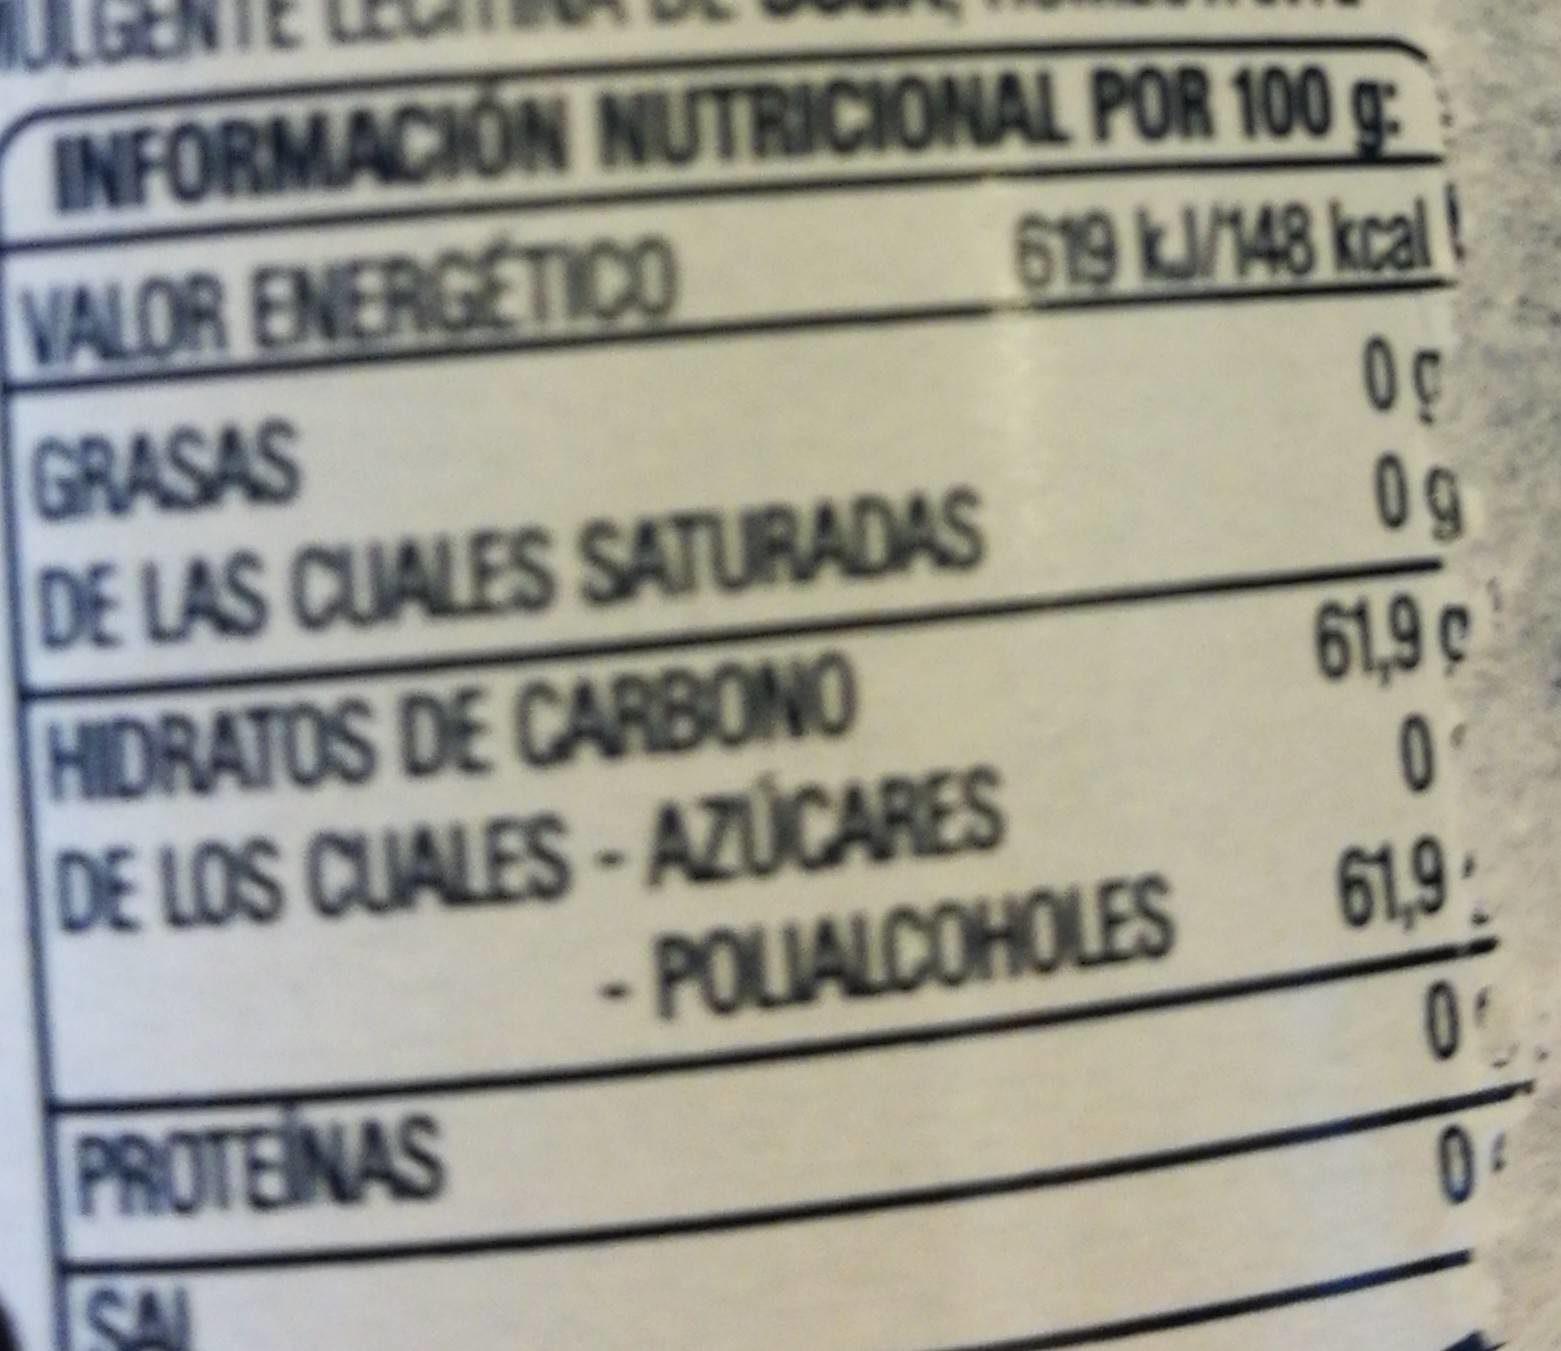 Chicles sabor eucalipto - Voedingswaarden - fr